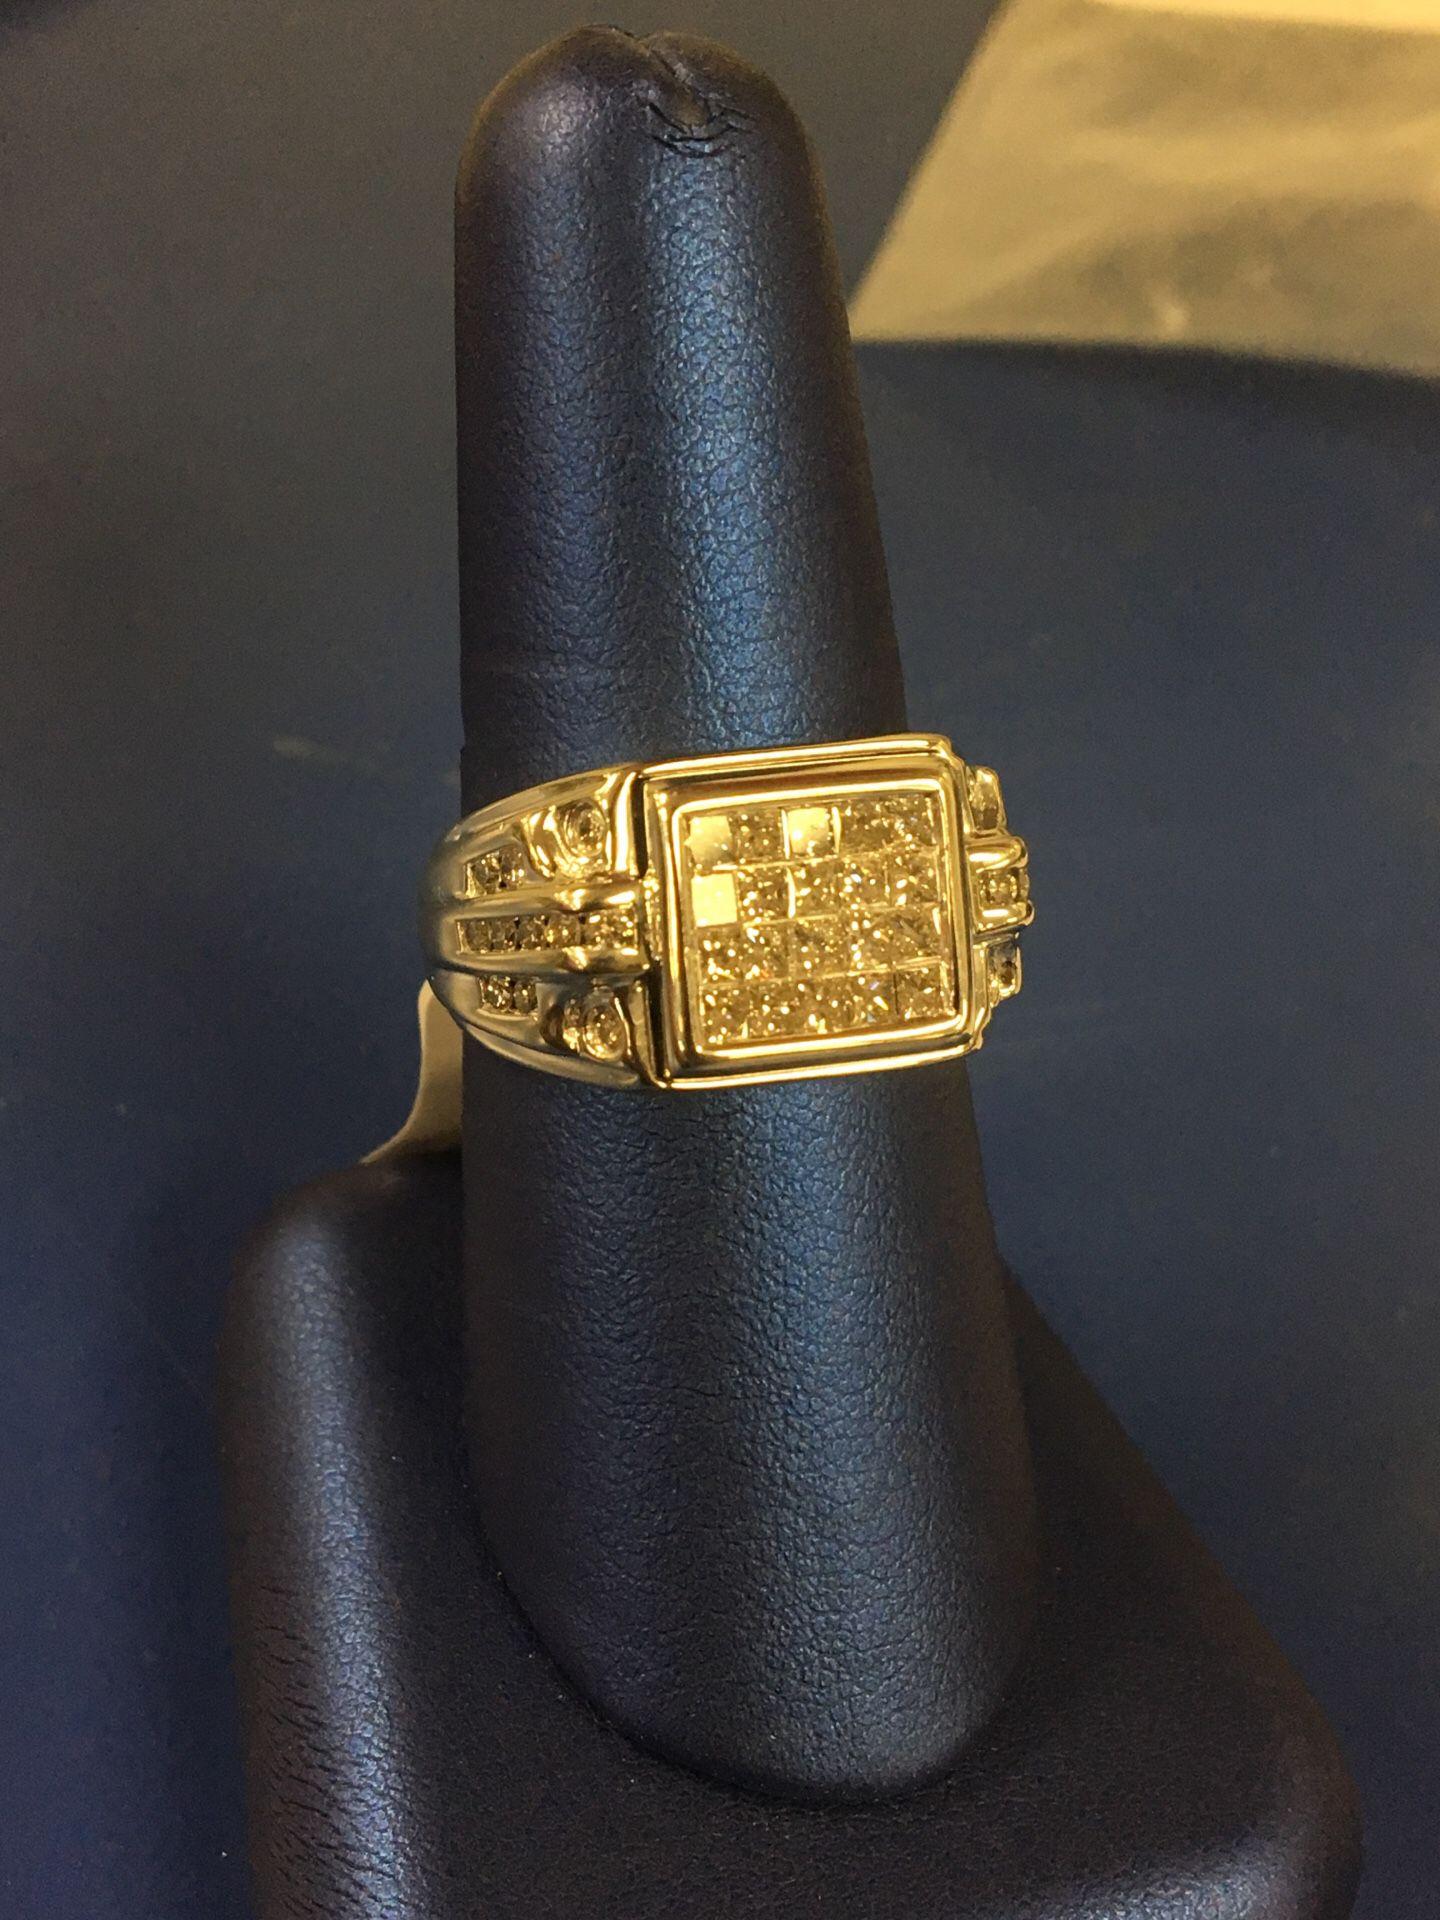 14k men's ring with diamonds